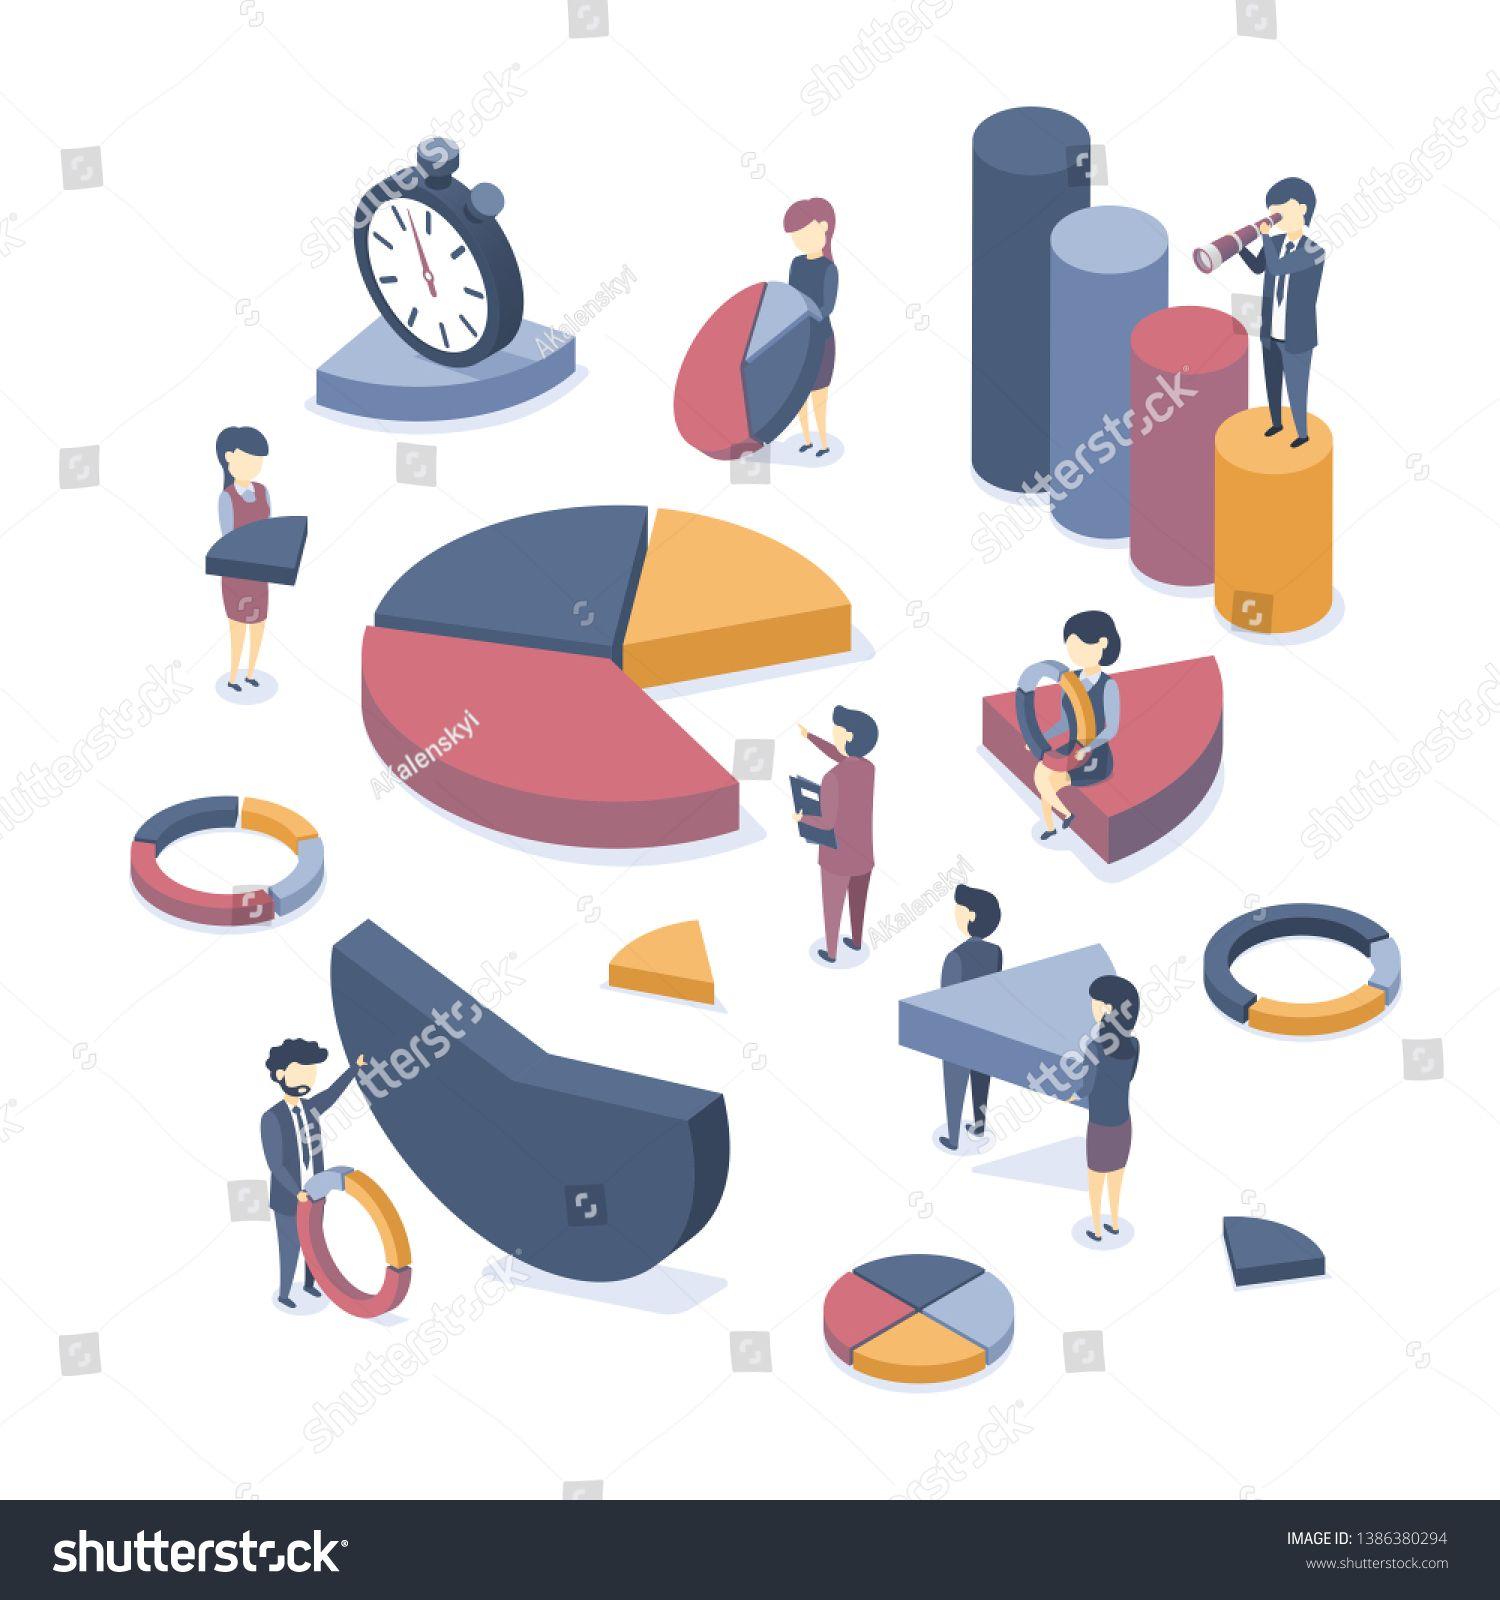 Isometric Vector Illustration Concept Of Data Analysis